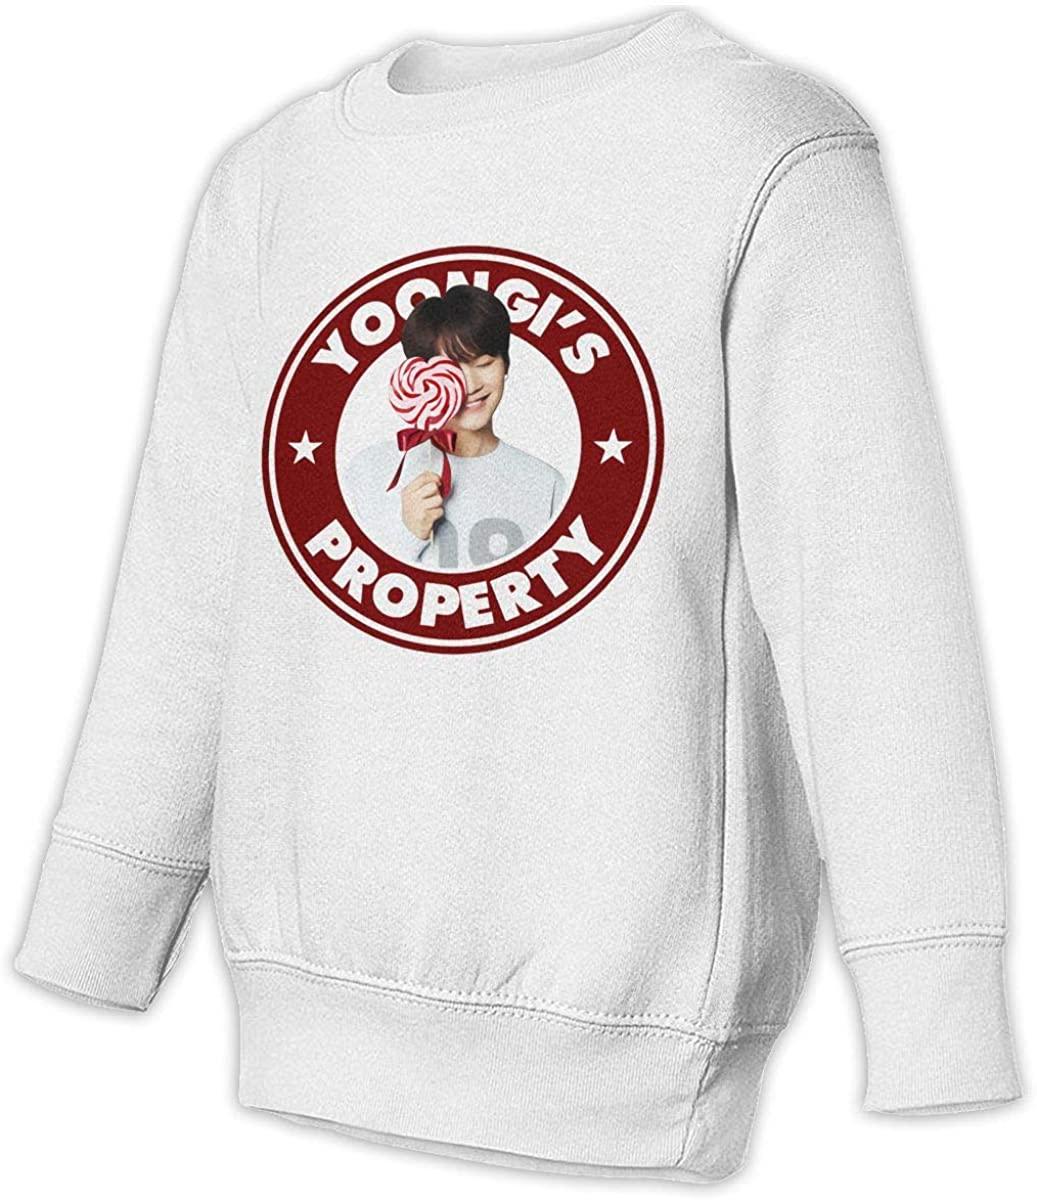 NOT Yoongi'S Property Unisex Sweatshirt Youth Boy and Girls Pullover Sweatshirt White